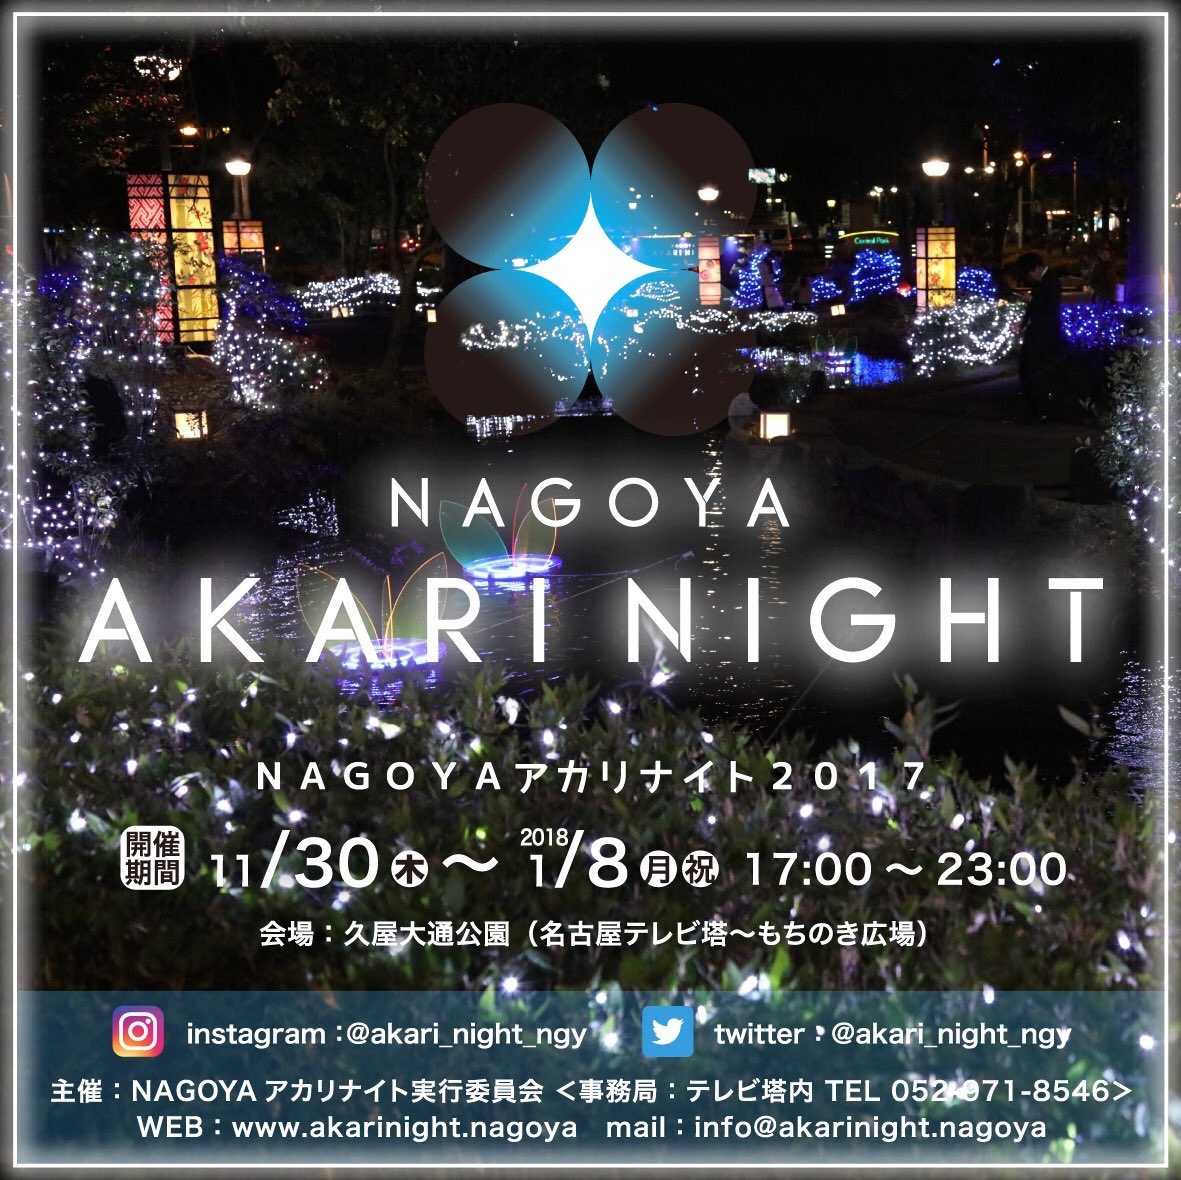 NAGOYAアカリナイト2017